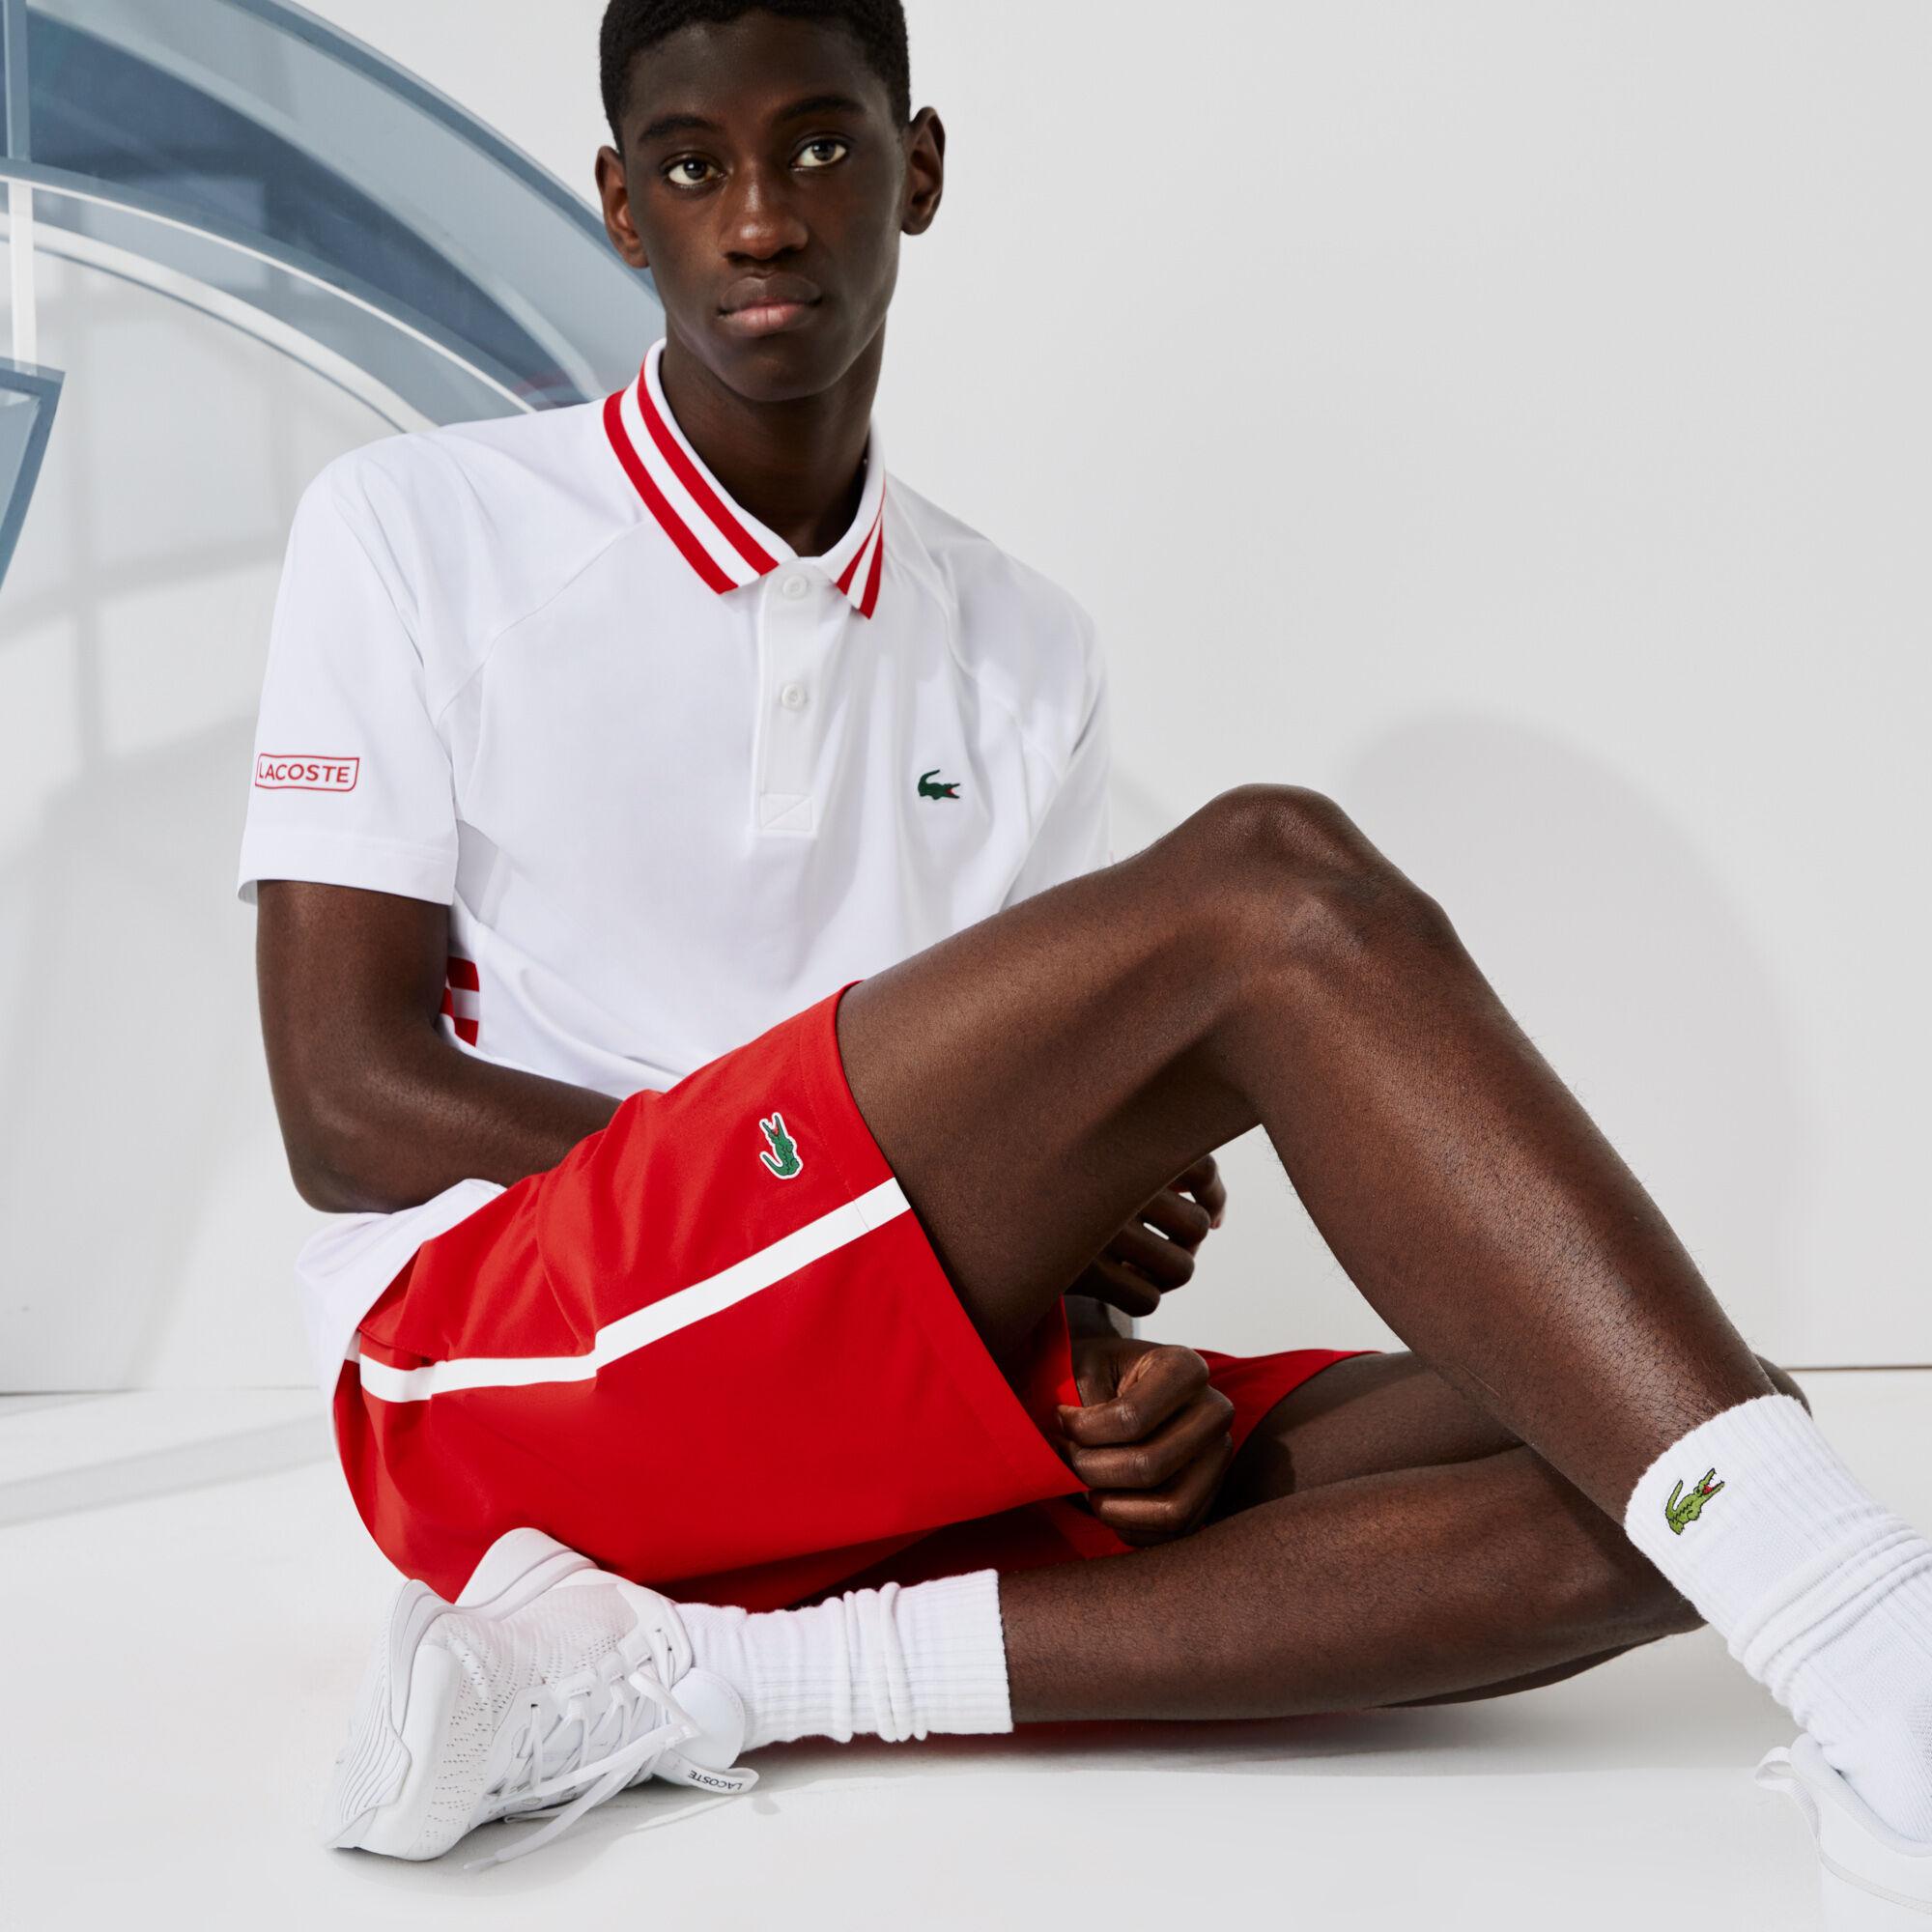 Men's Lacoste SPORT x Novak Djokovic Breathable Stretch Shorts